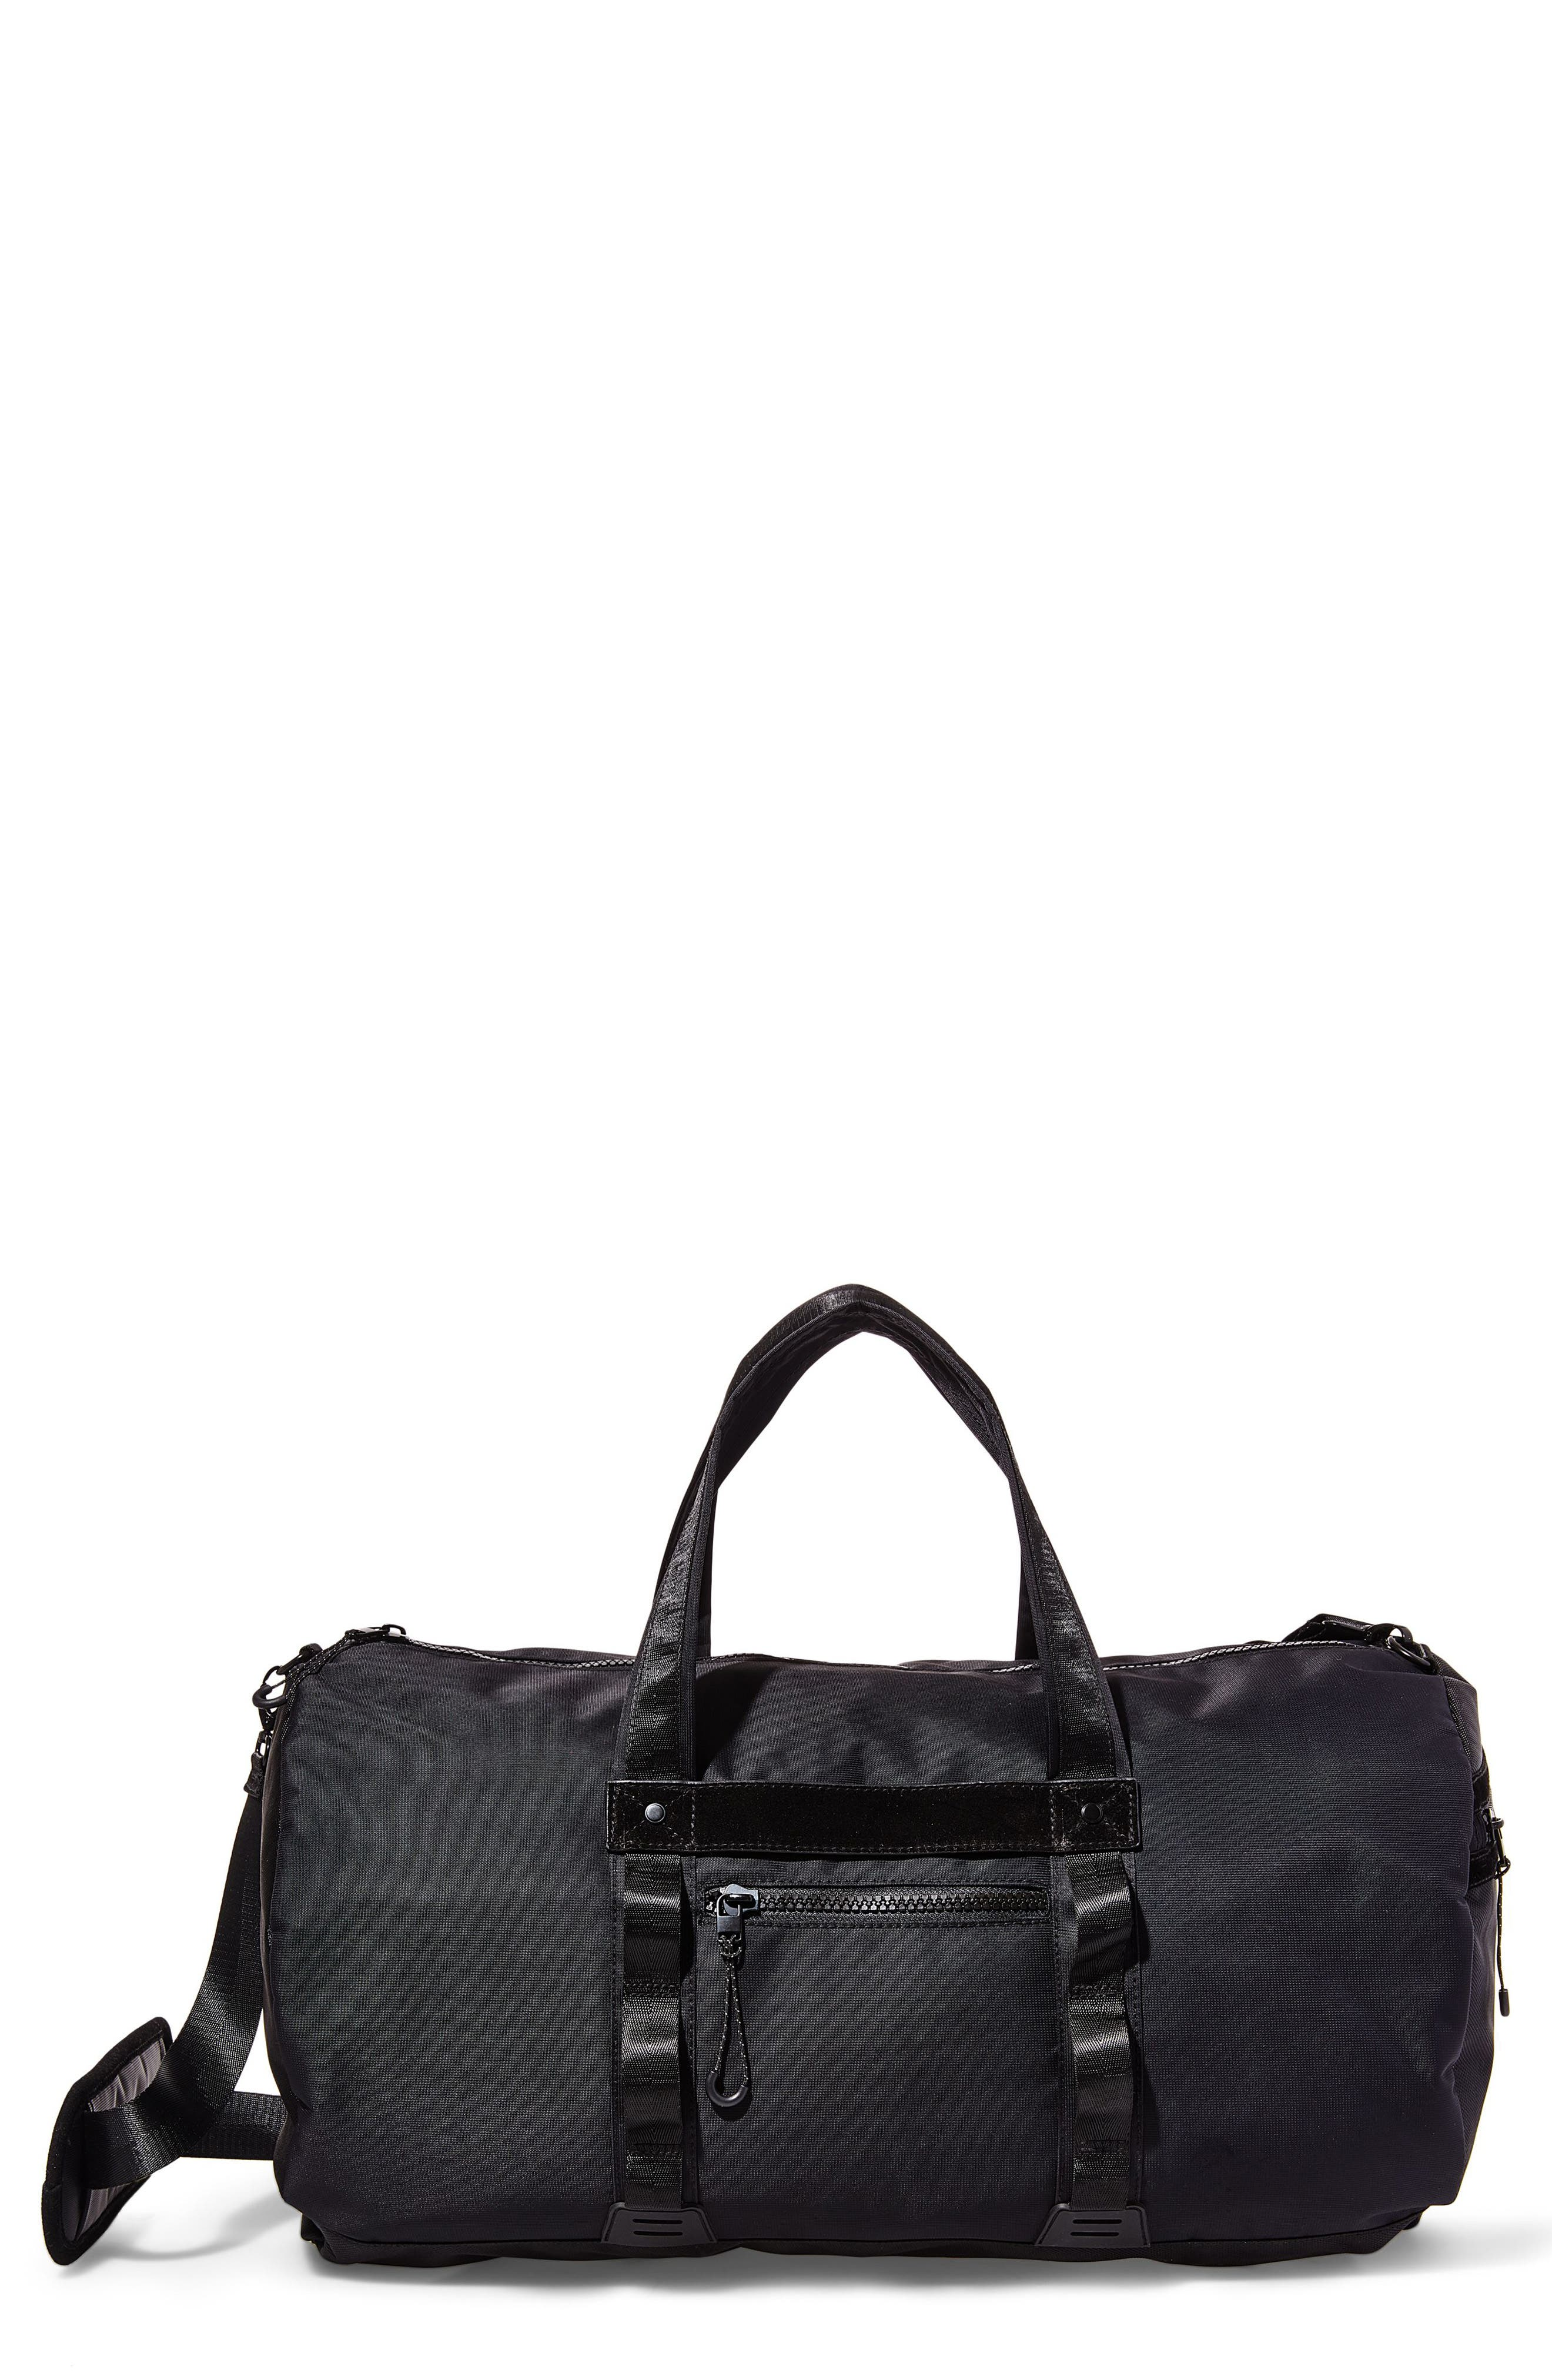 GQ x Steve Madden Duffel Bag,                         Main,                         color,